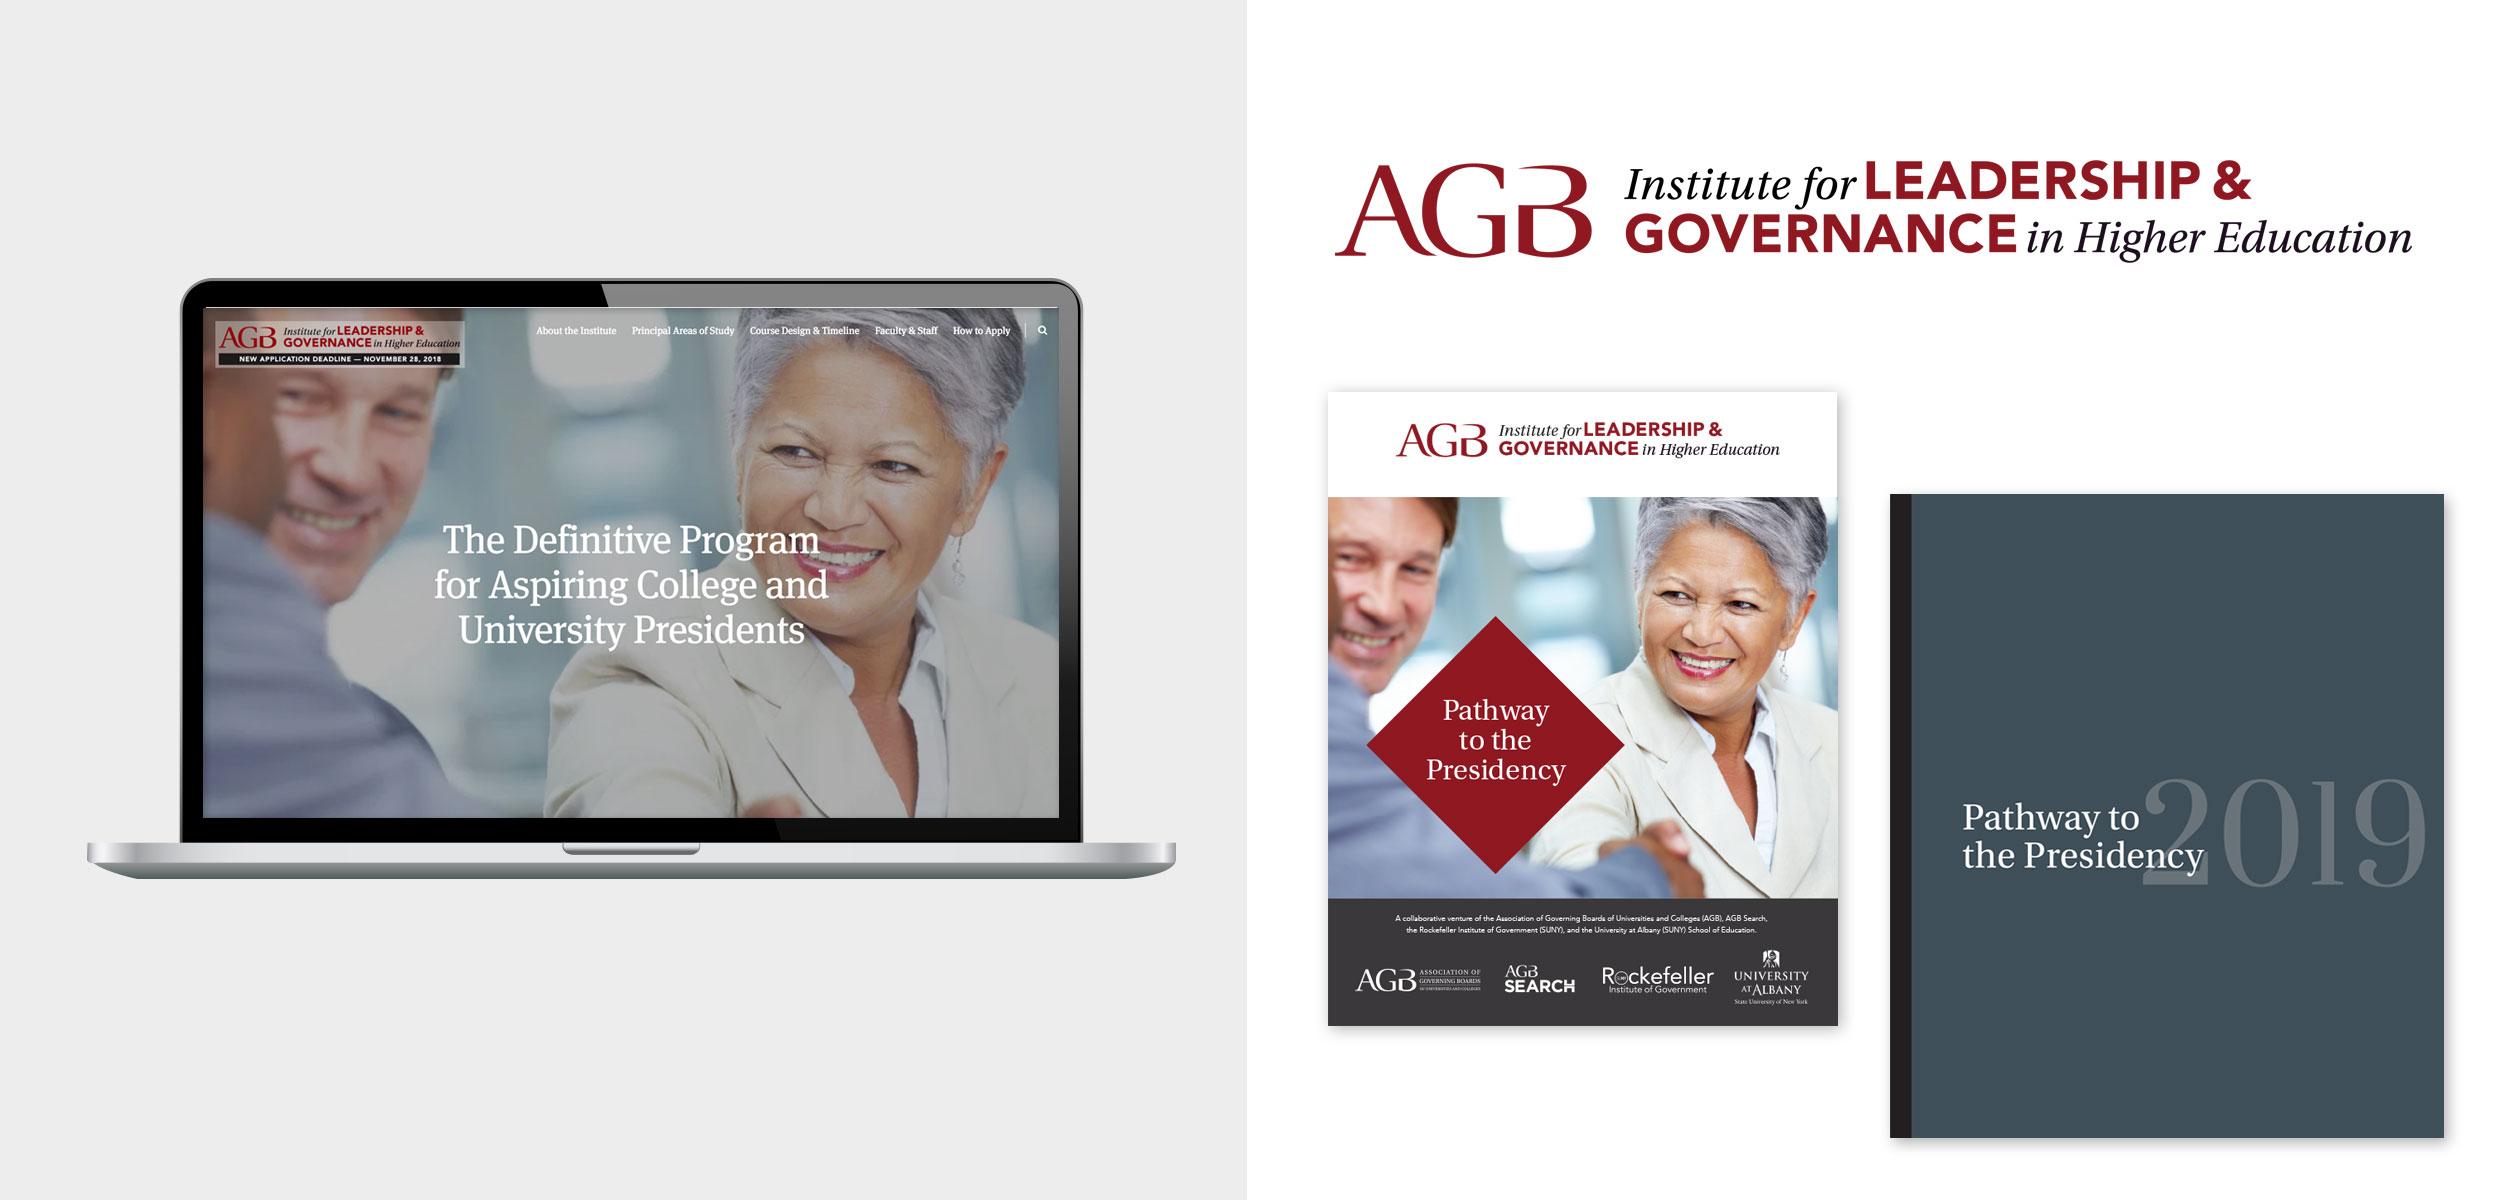 AGB-ILG-1.jpg